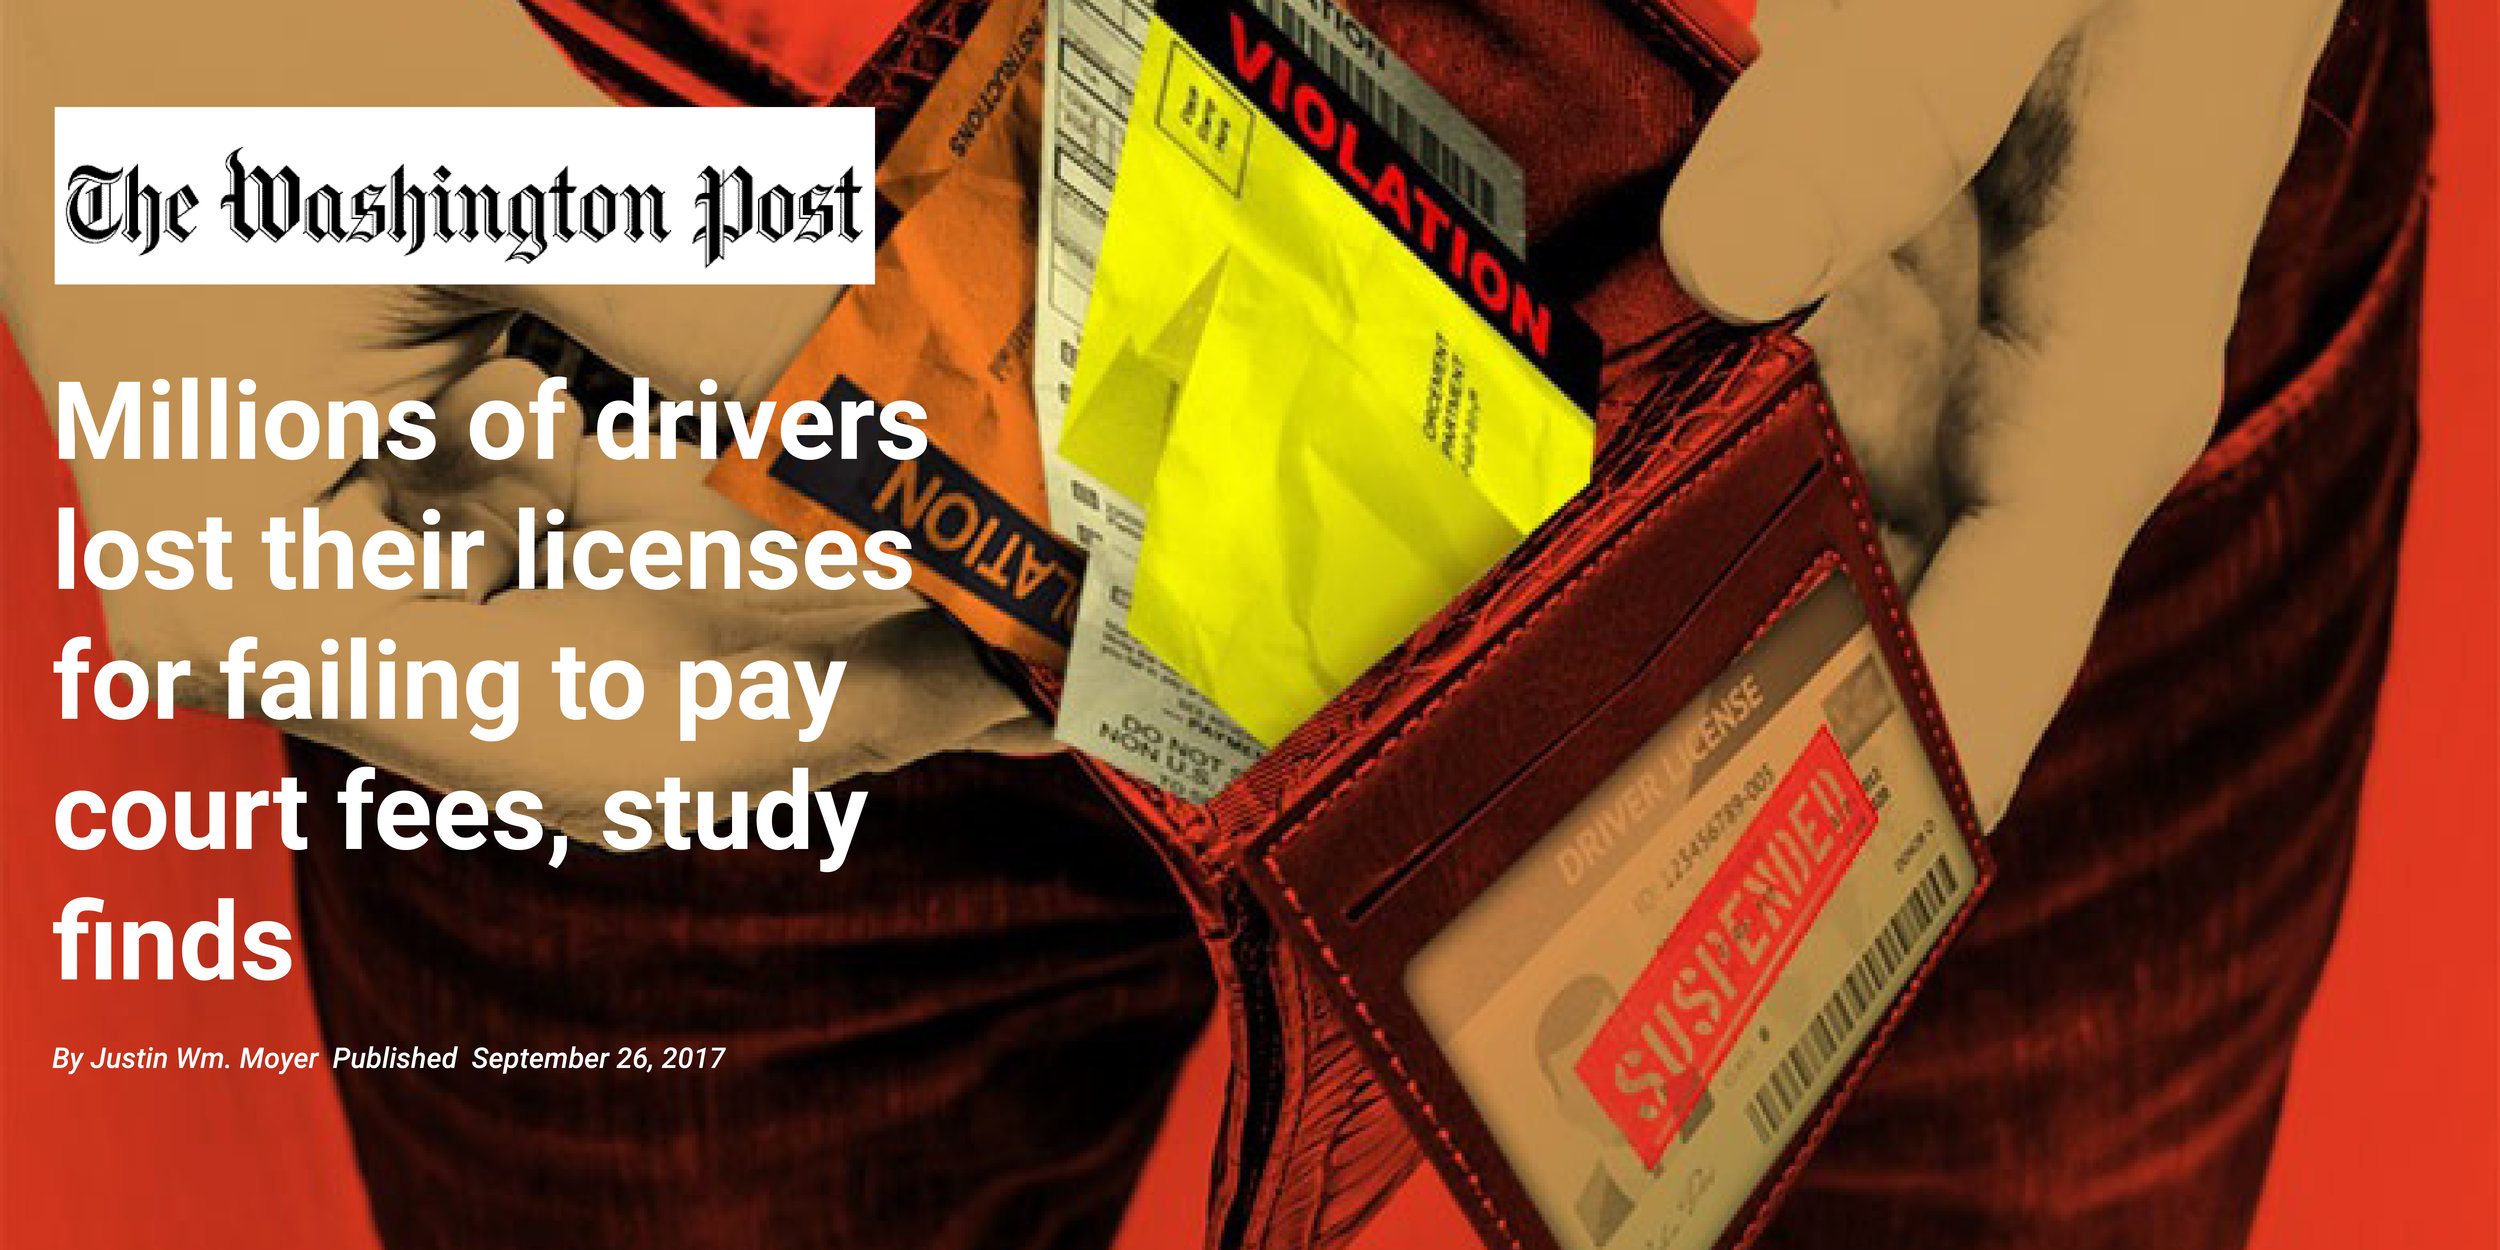 Drivers License Fowler News8.jpg